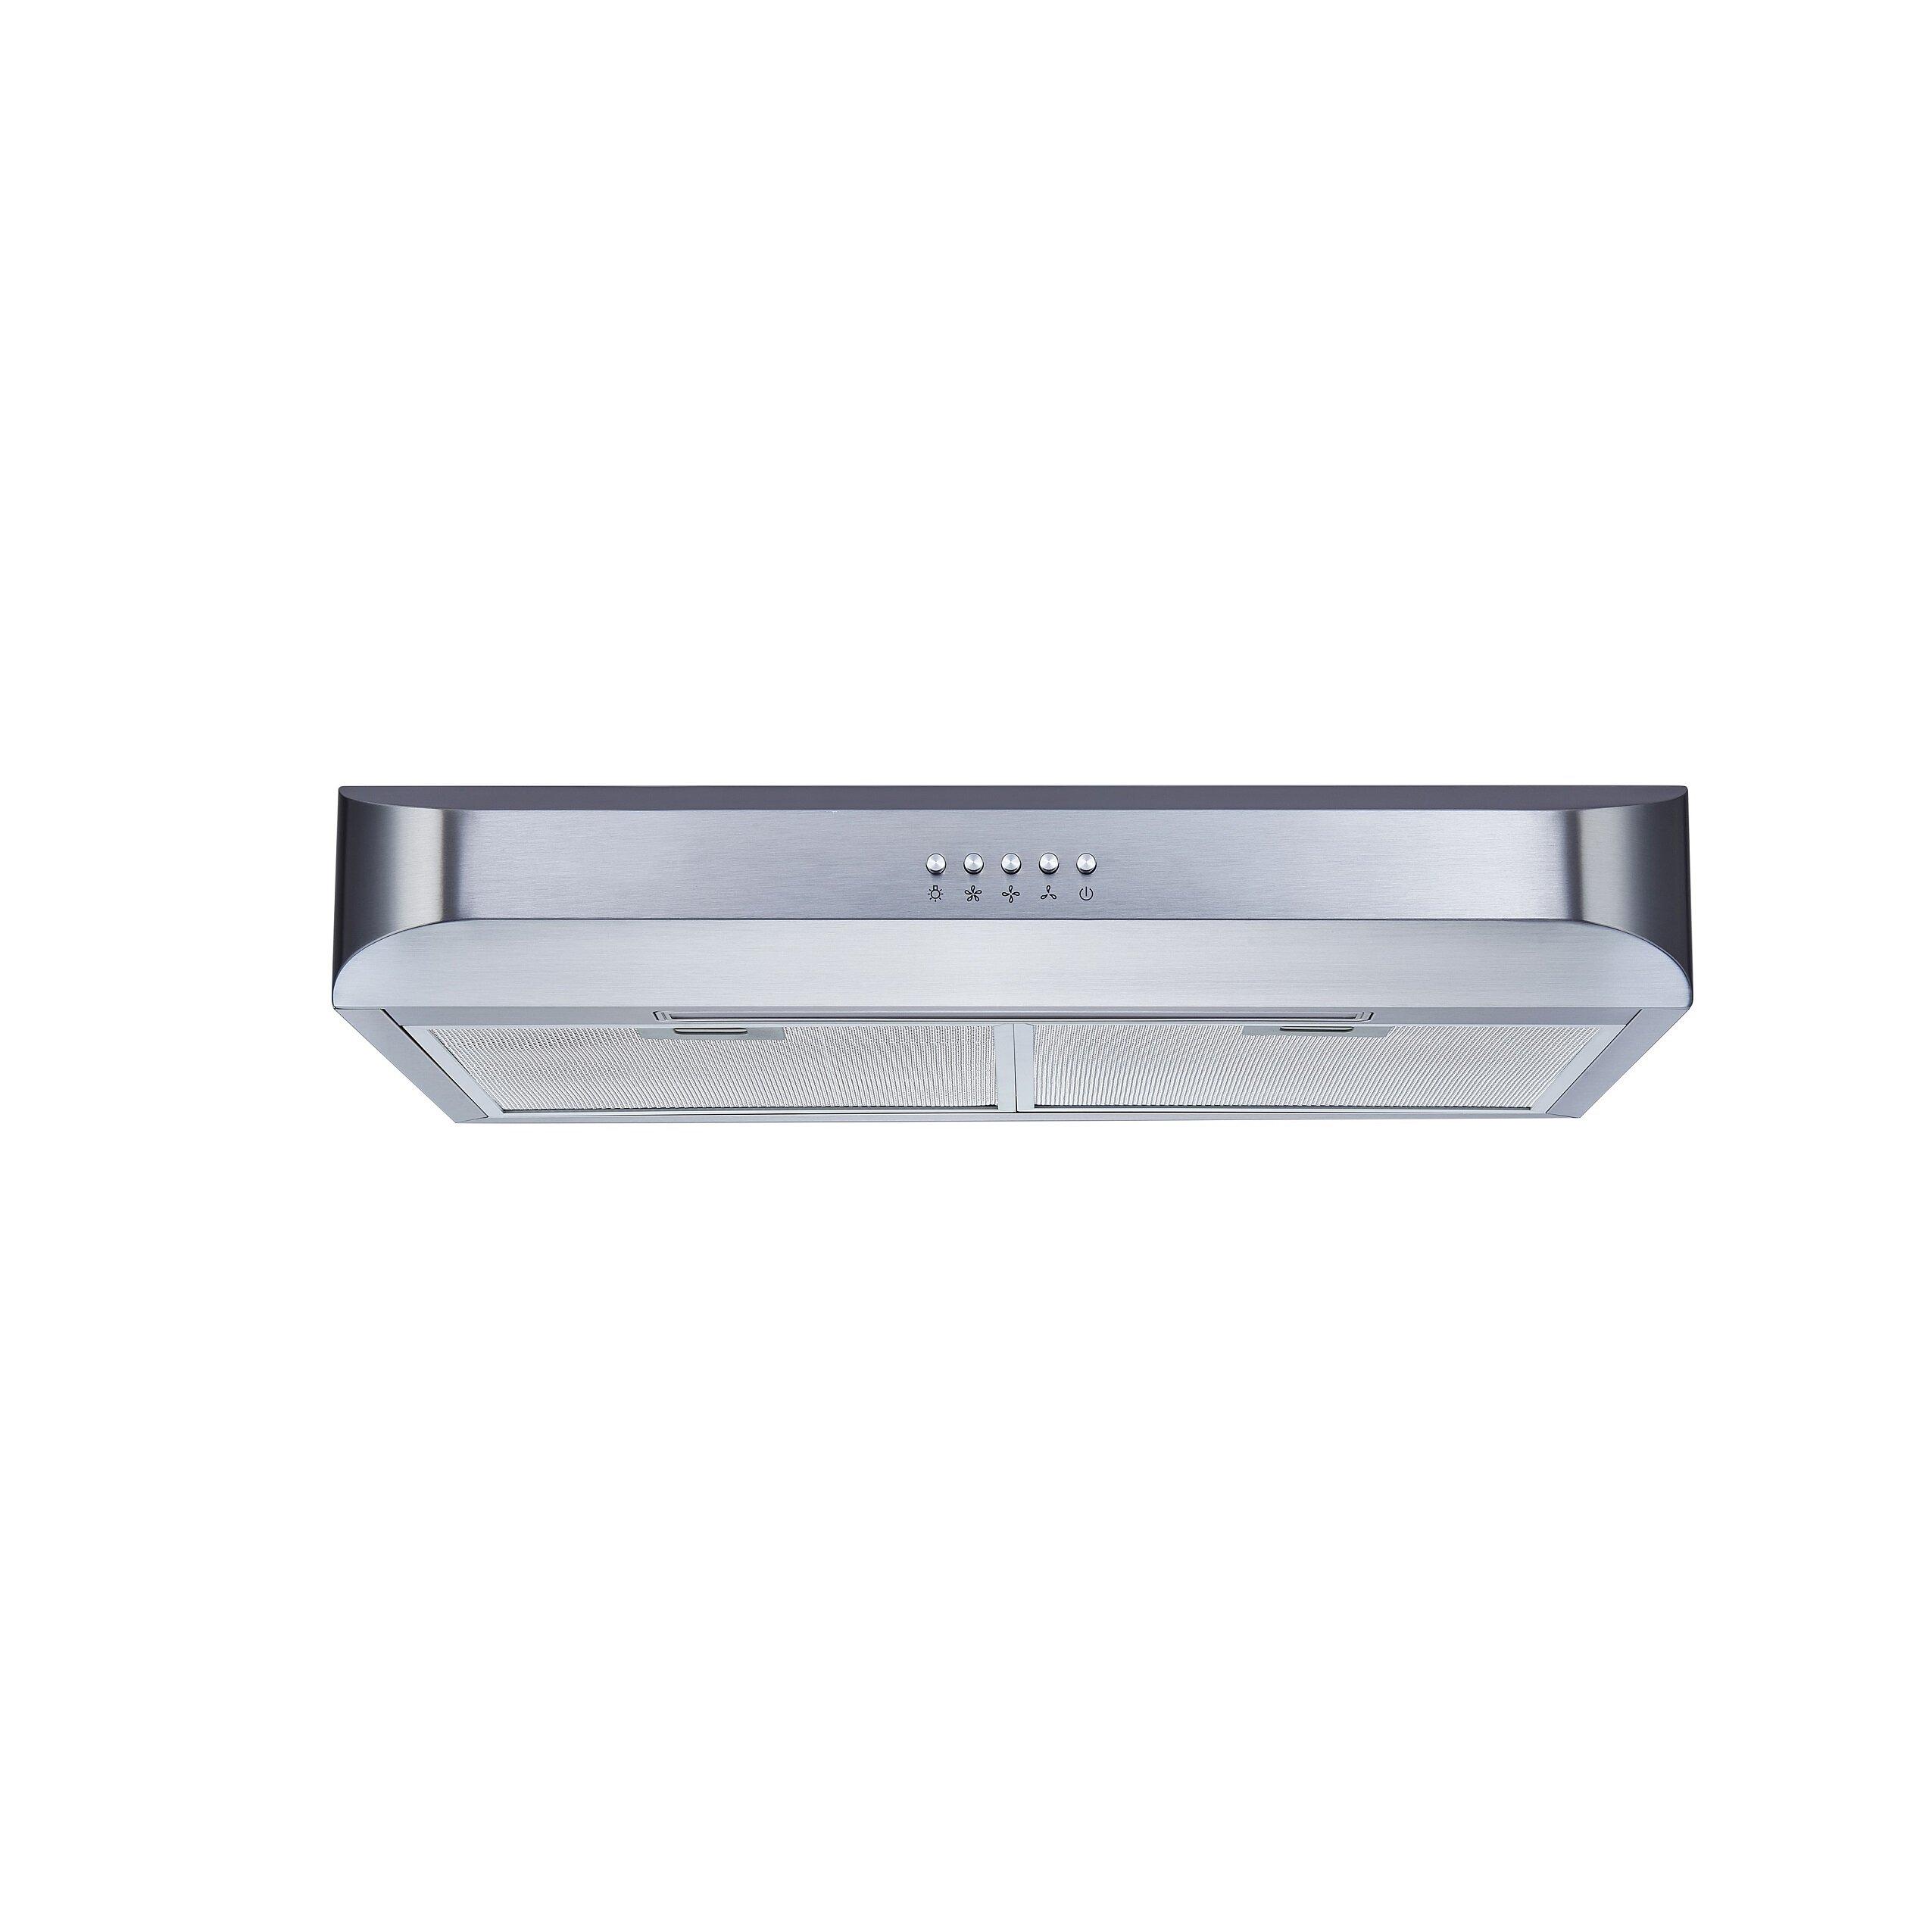 30 Under Cabinet Range Hood Winflo 30 250 Cfm Convertible Under Cabinet Range Hood Reviews